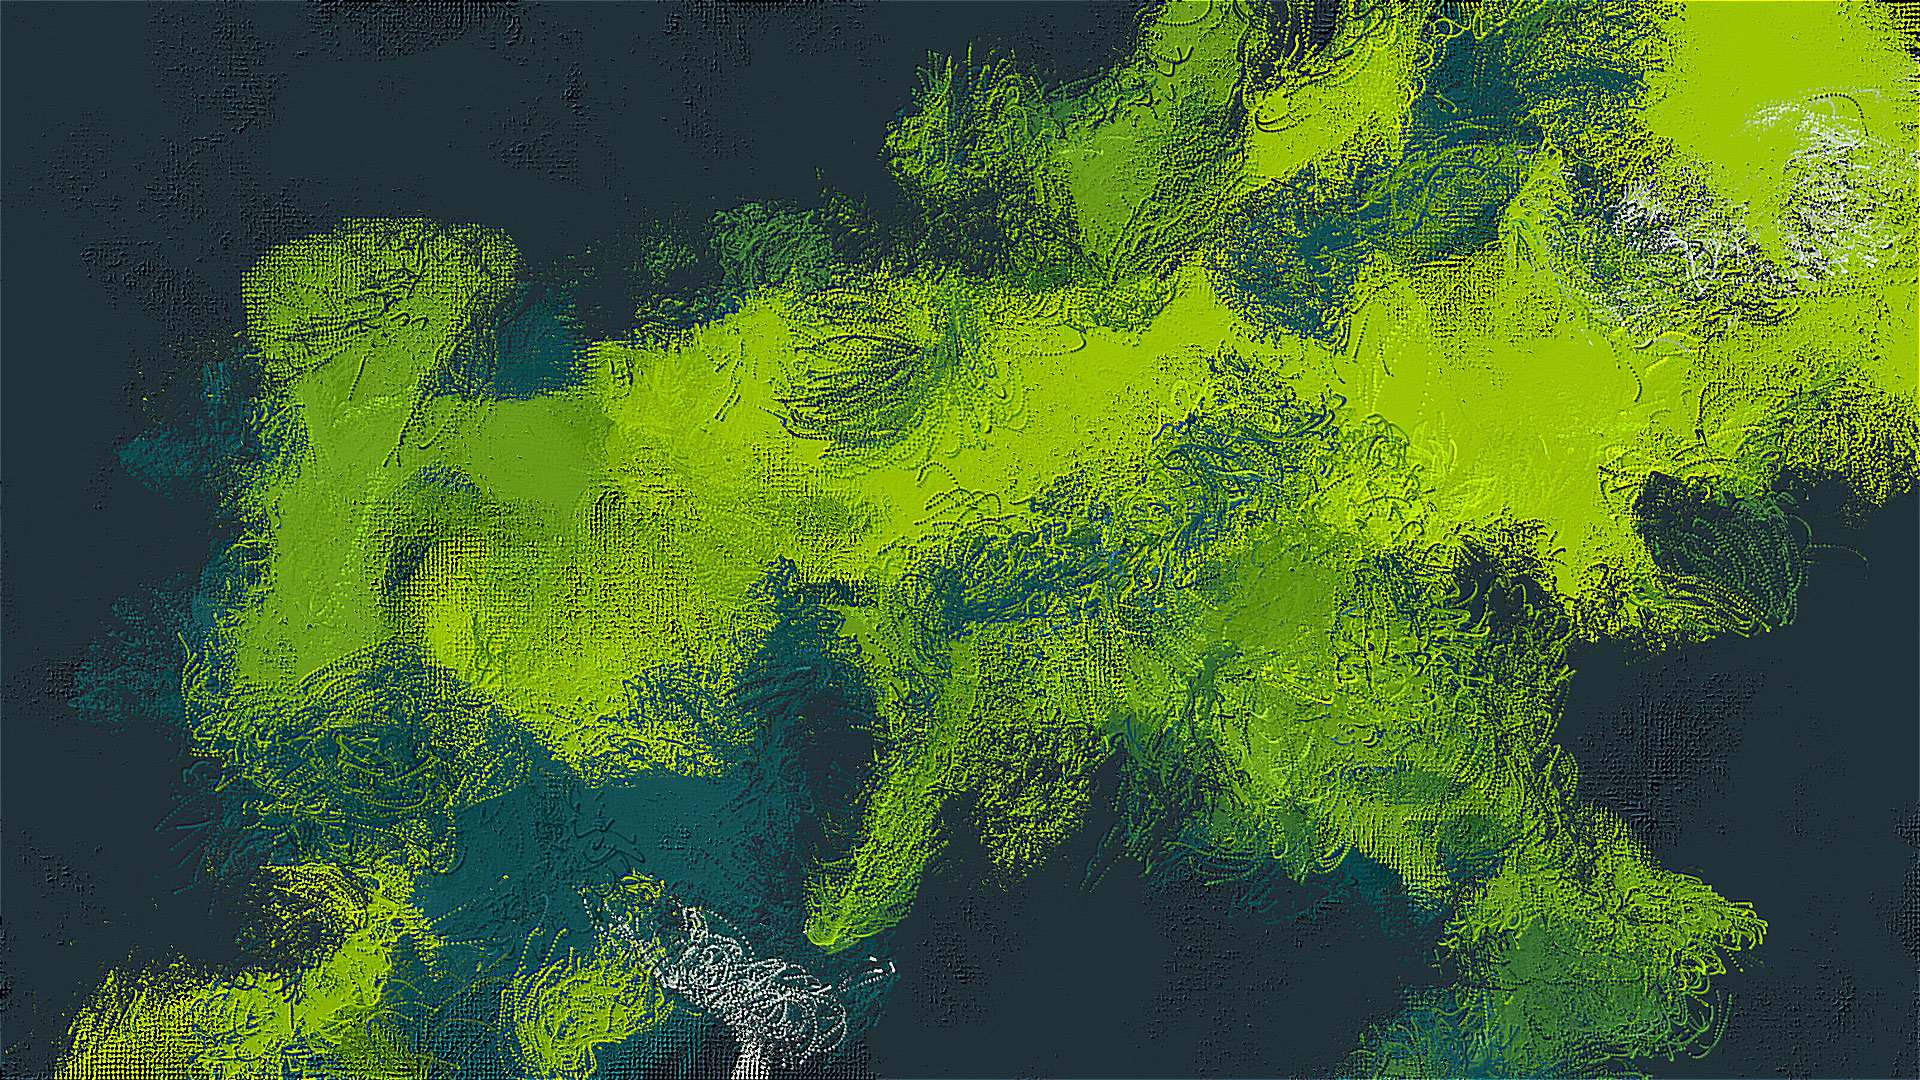 00-painterly-(0-00-01-03)_2.jpg